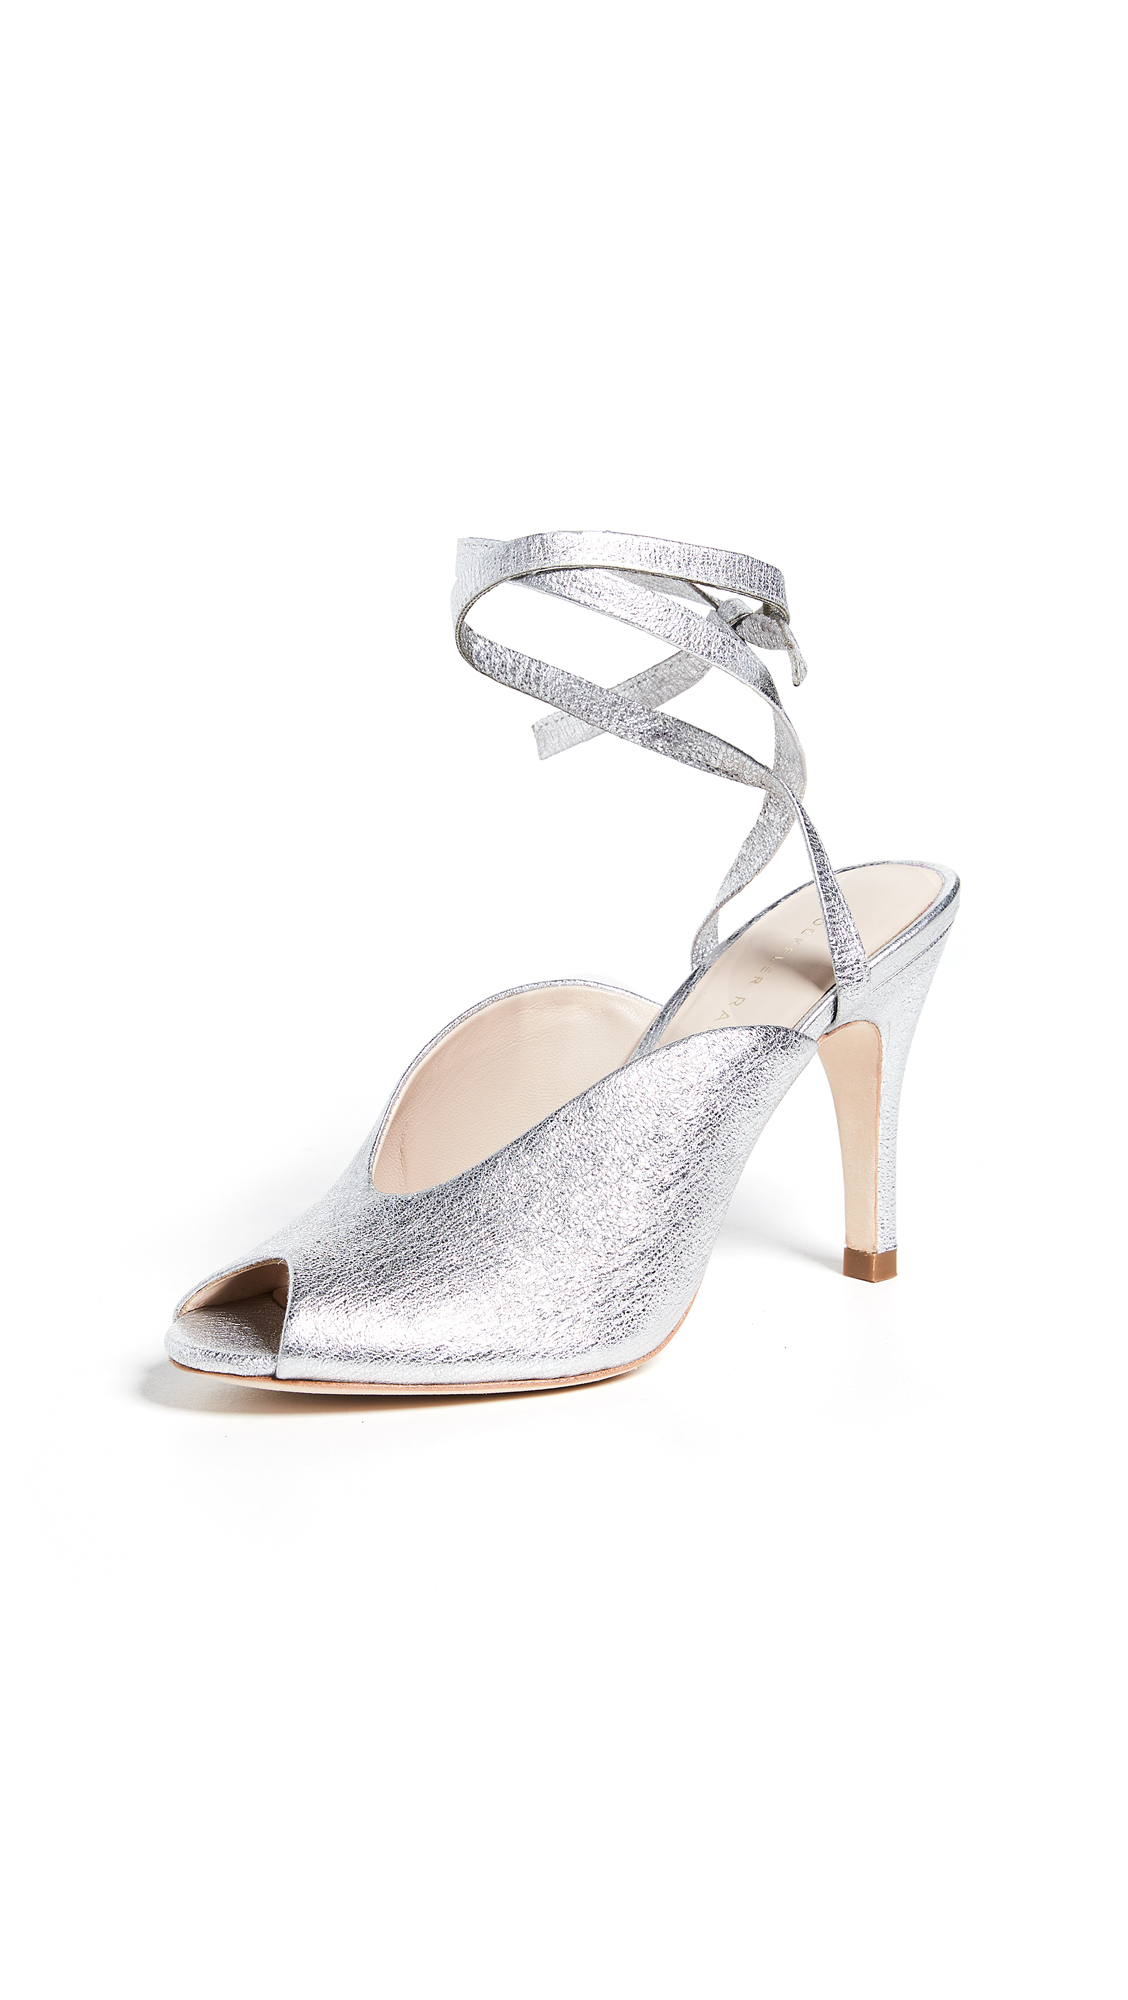 Loeffler Randall Mila Wrap Sandals - Silver